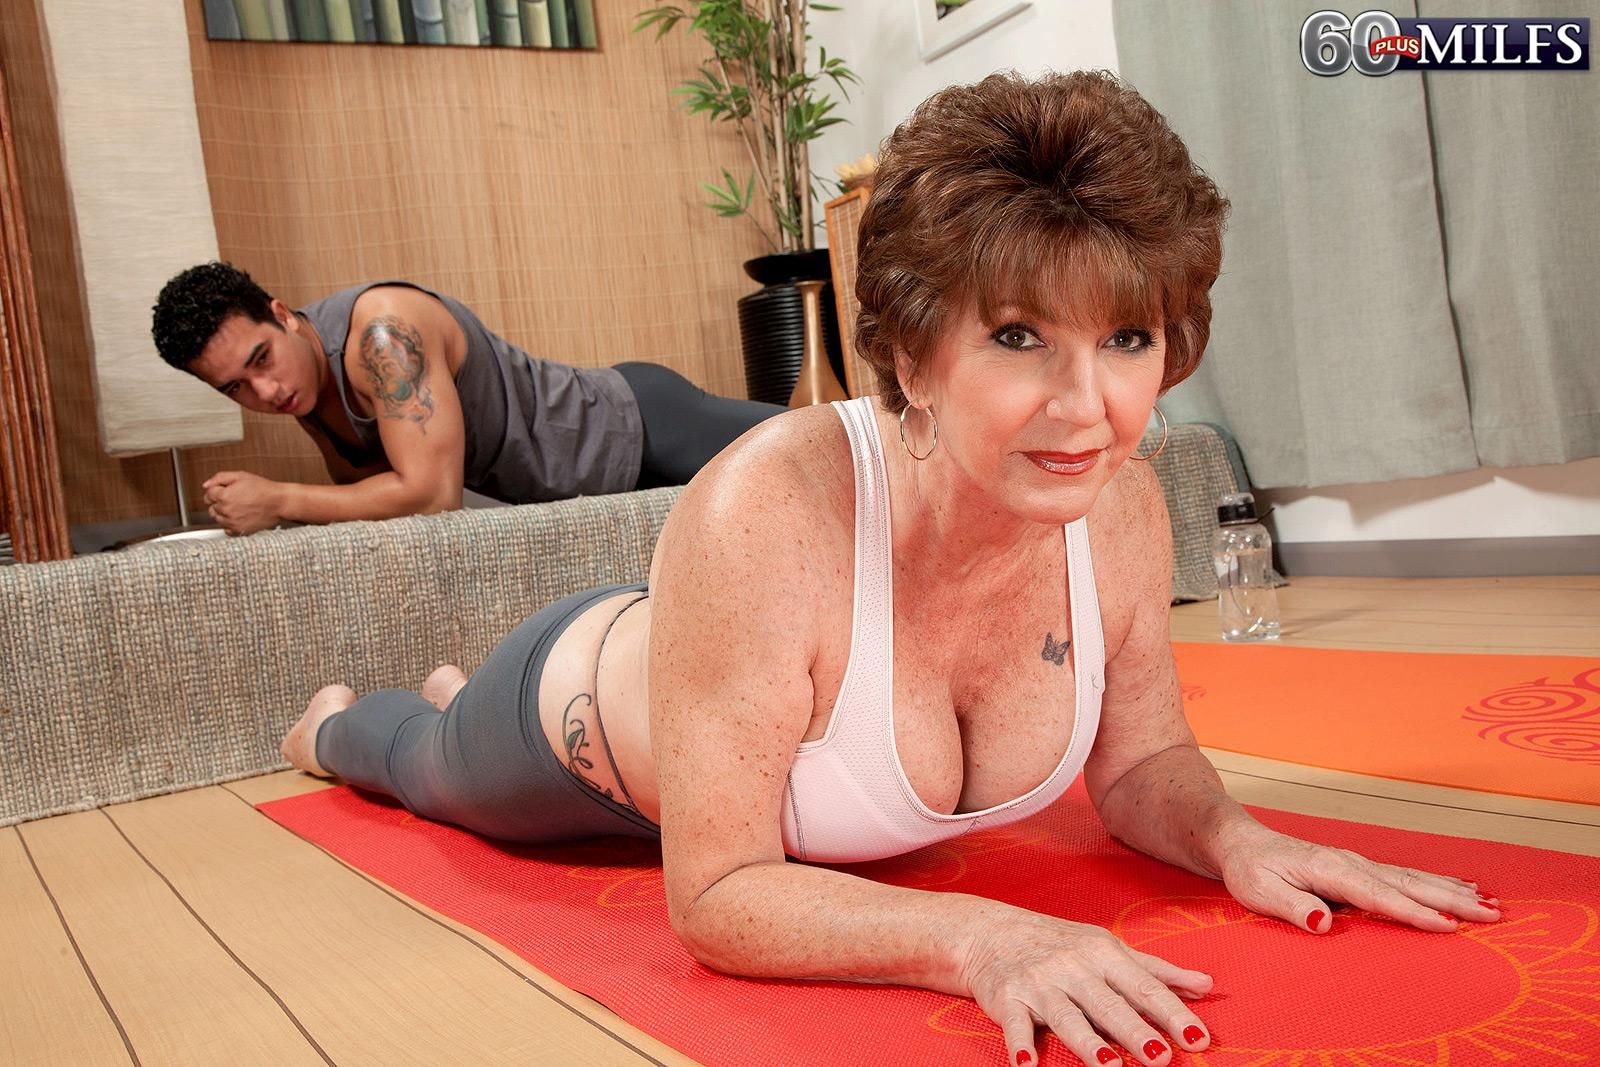 Huge-boobed 60 plus MILF Bea Cummins unleashing giant boobs in spandex pants and thong panties